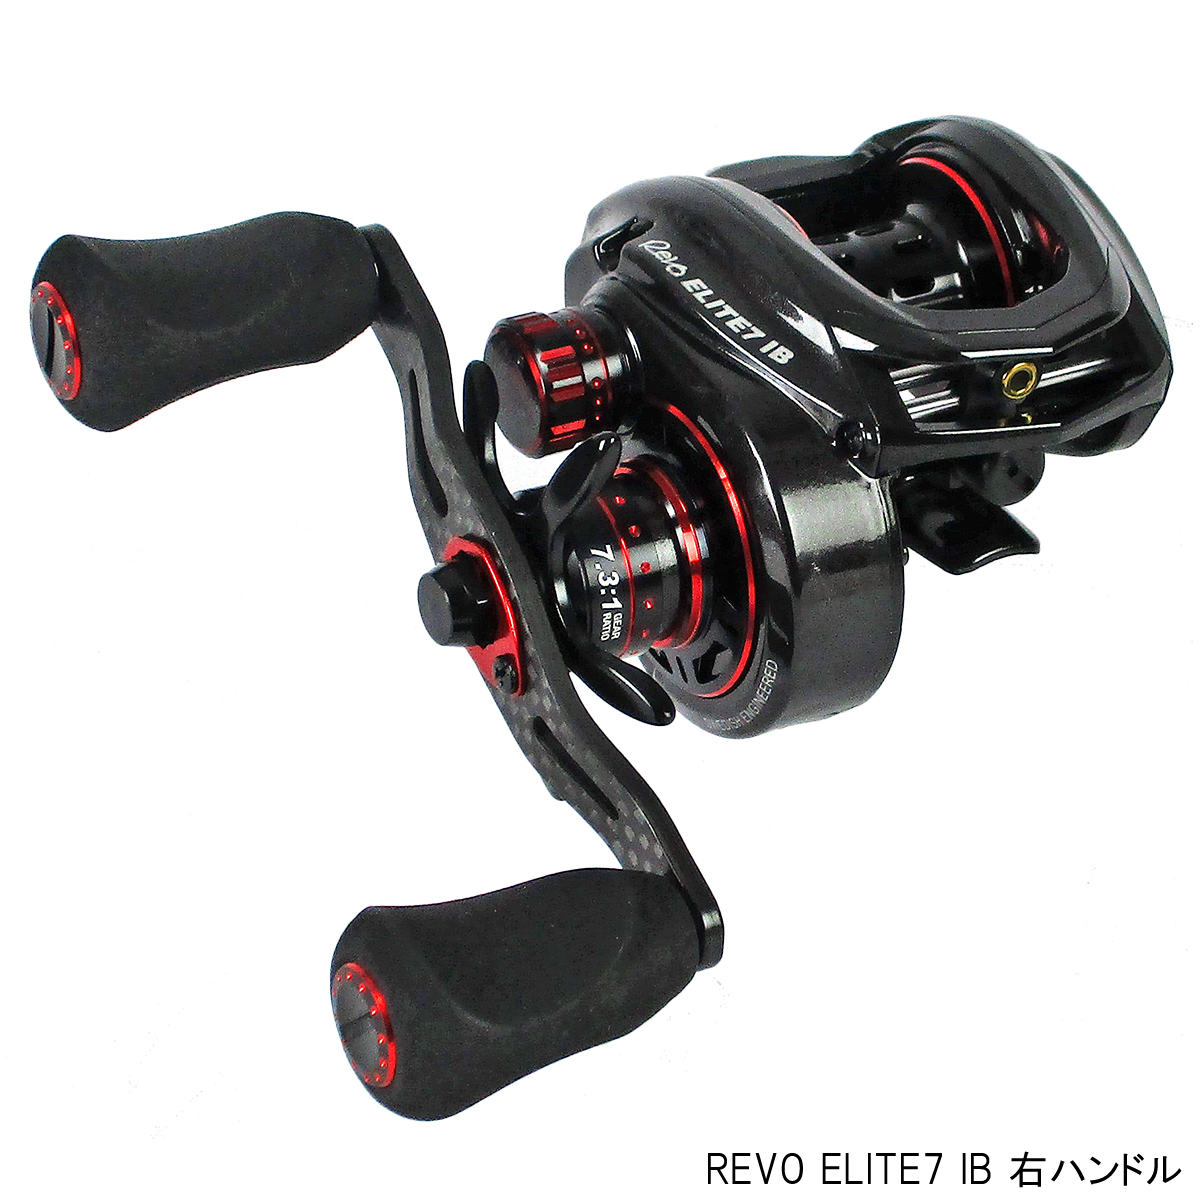 REVO ELITE7 IB 右ハンドル【送料無料】